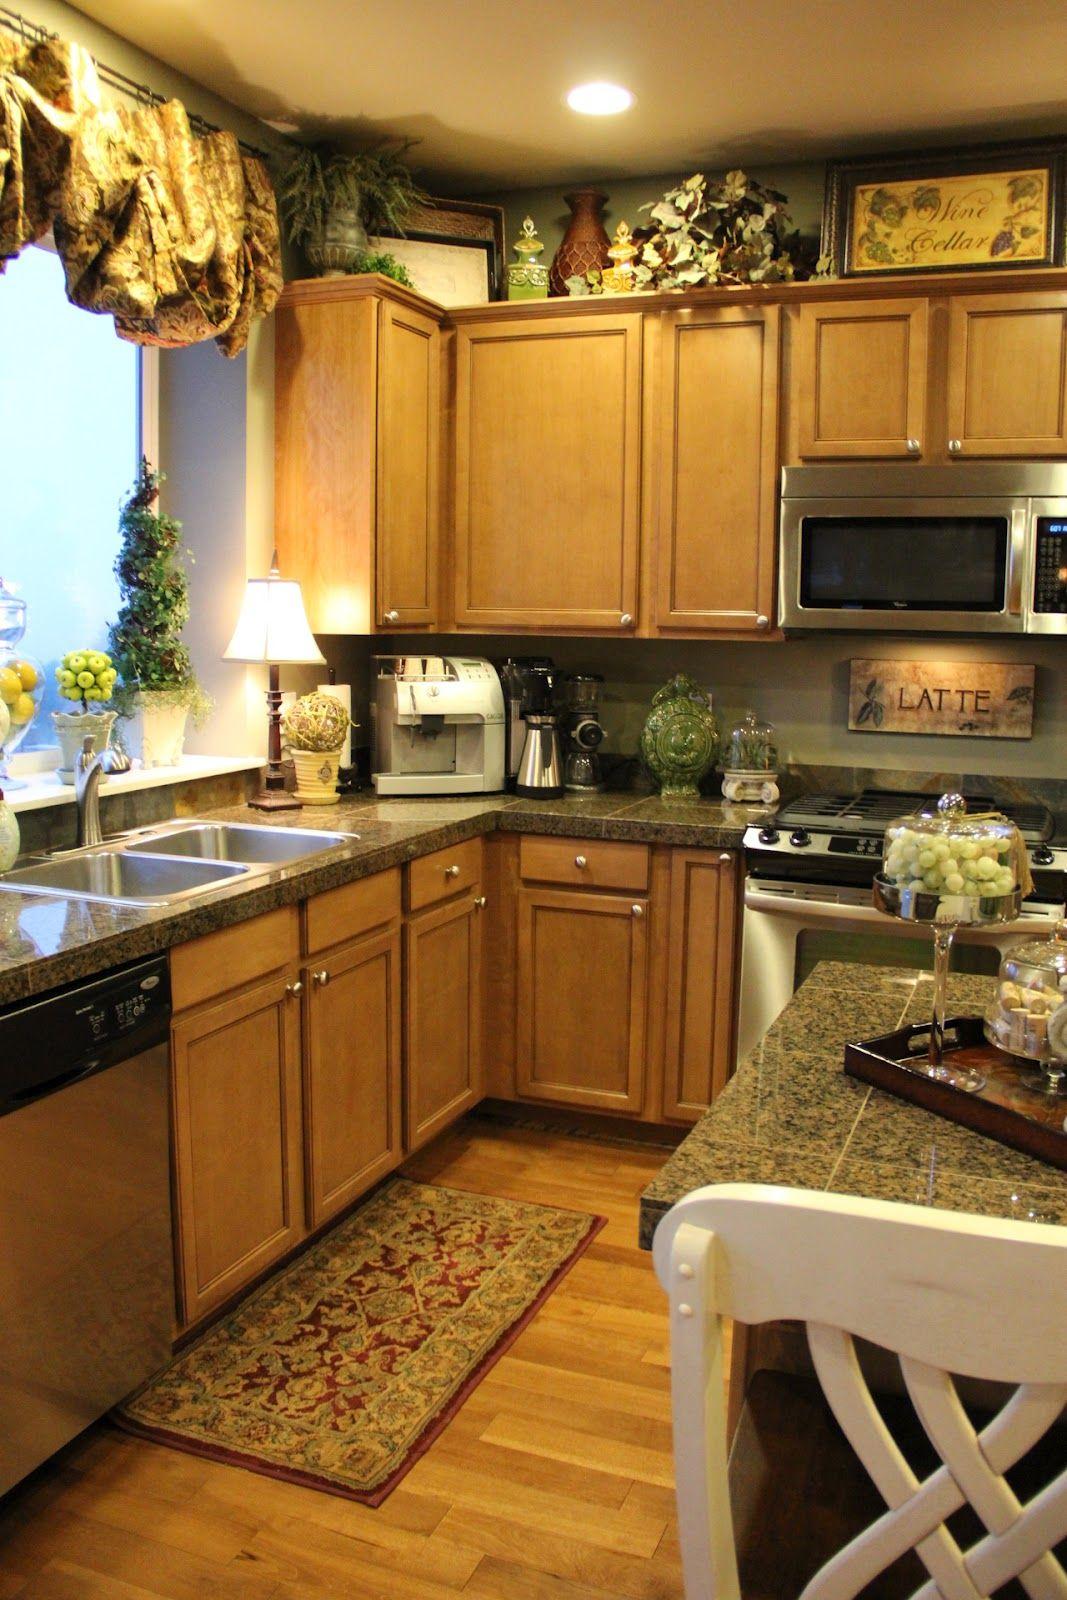 135 Jpg 1 067 1 600 Pixels Cabinet Decor Kitchen Decor Interior Decorating Living Room